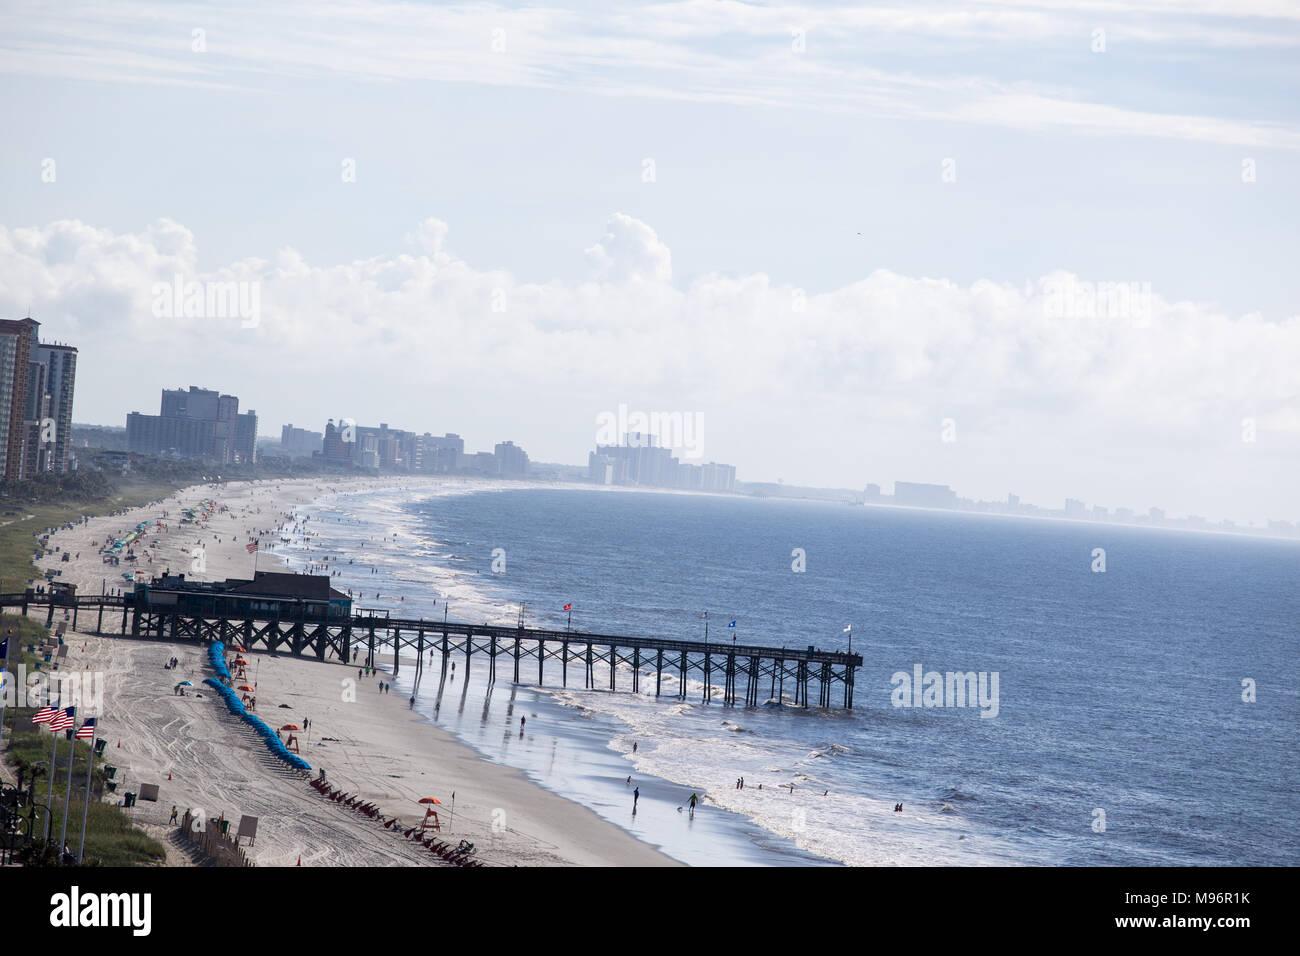 Distance Myrtle Beach To Sea Island